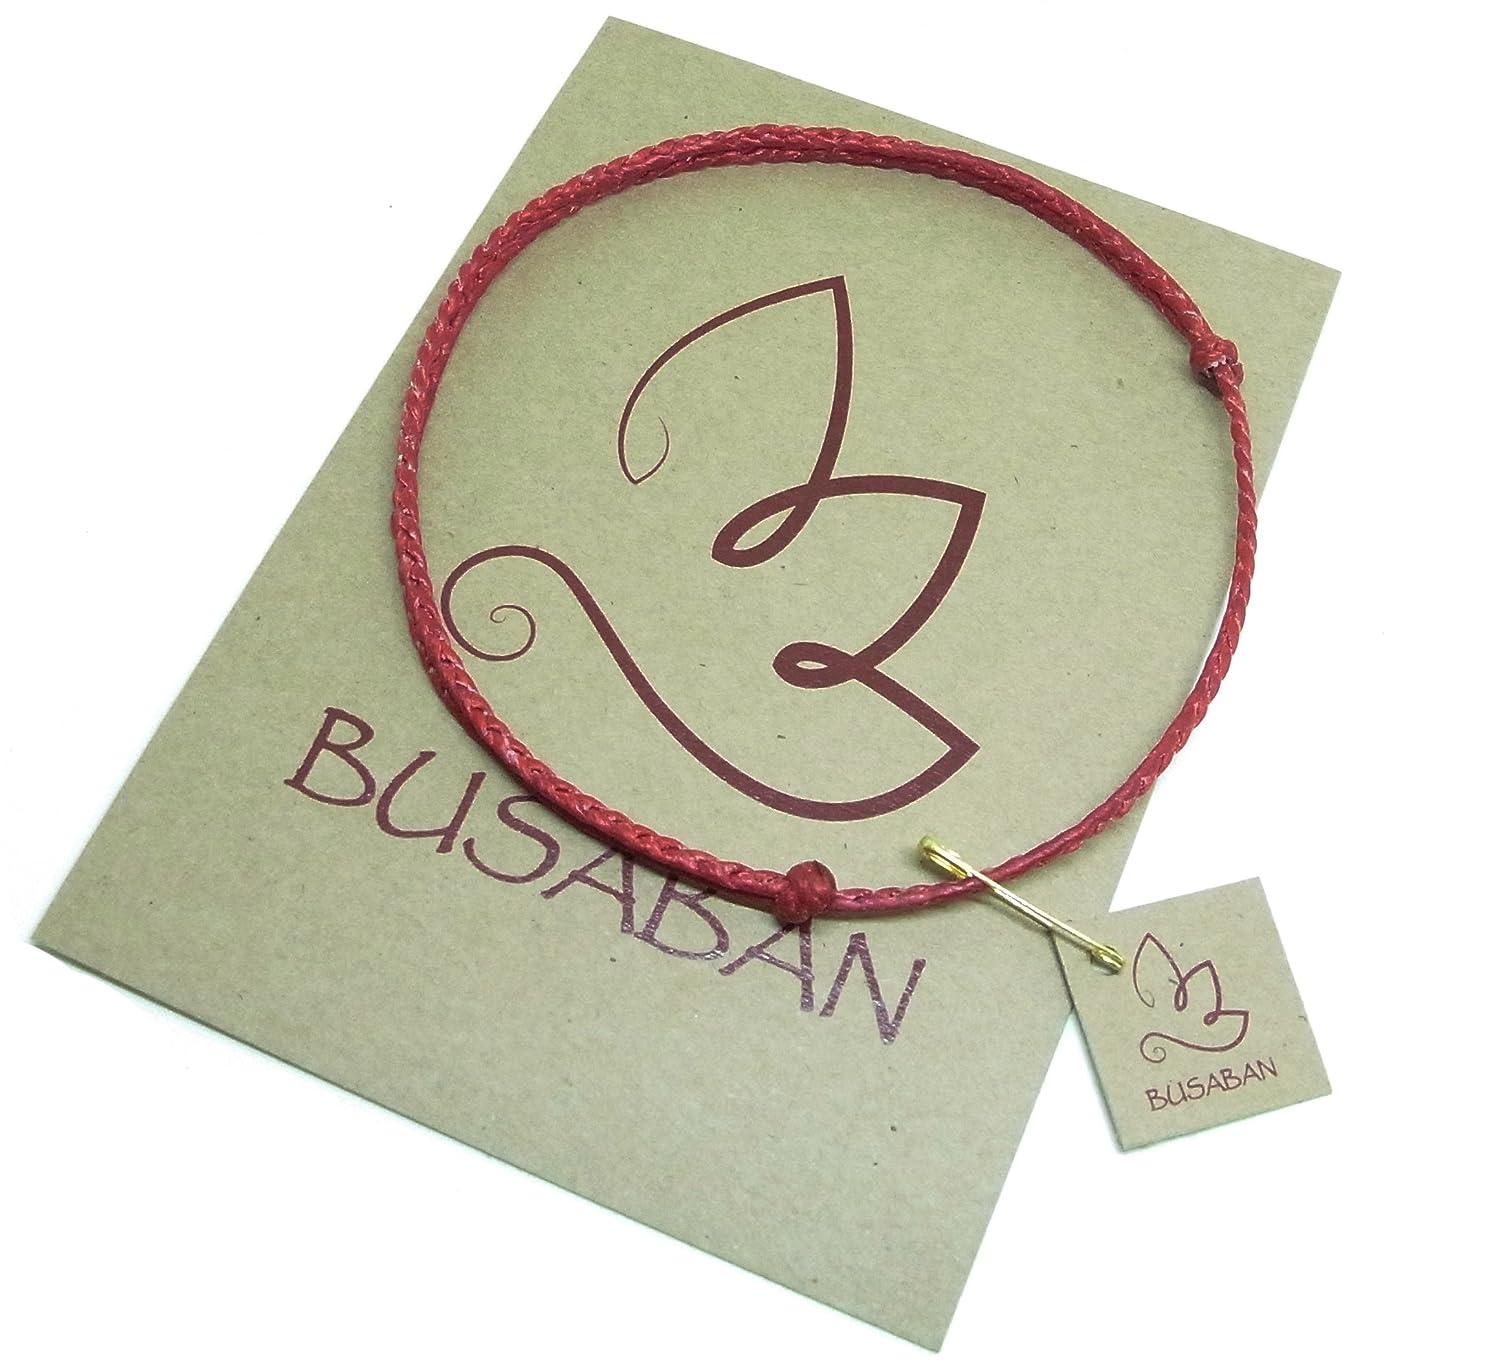 BUSABAN Asian Adjustable Handmade Braided Plaited Anklet Bracelet Wax Rope